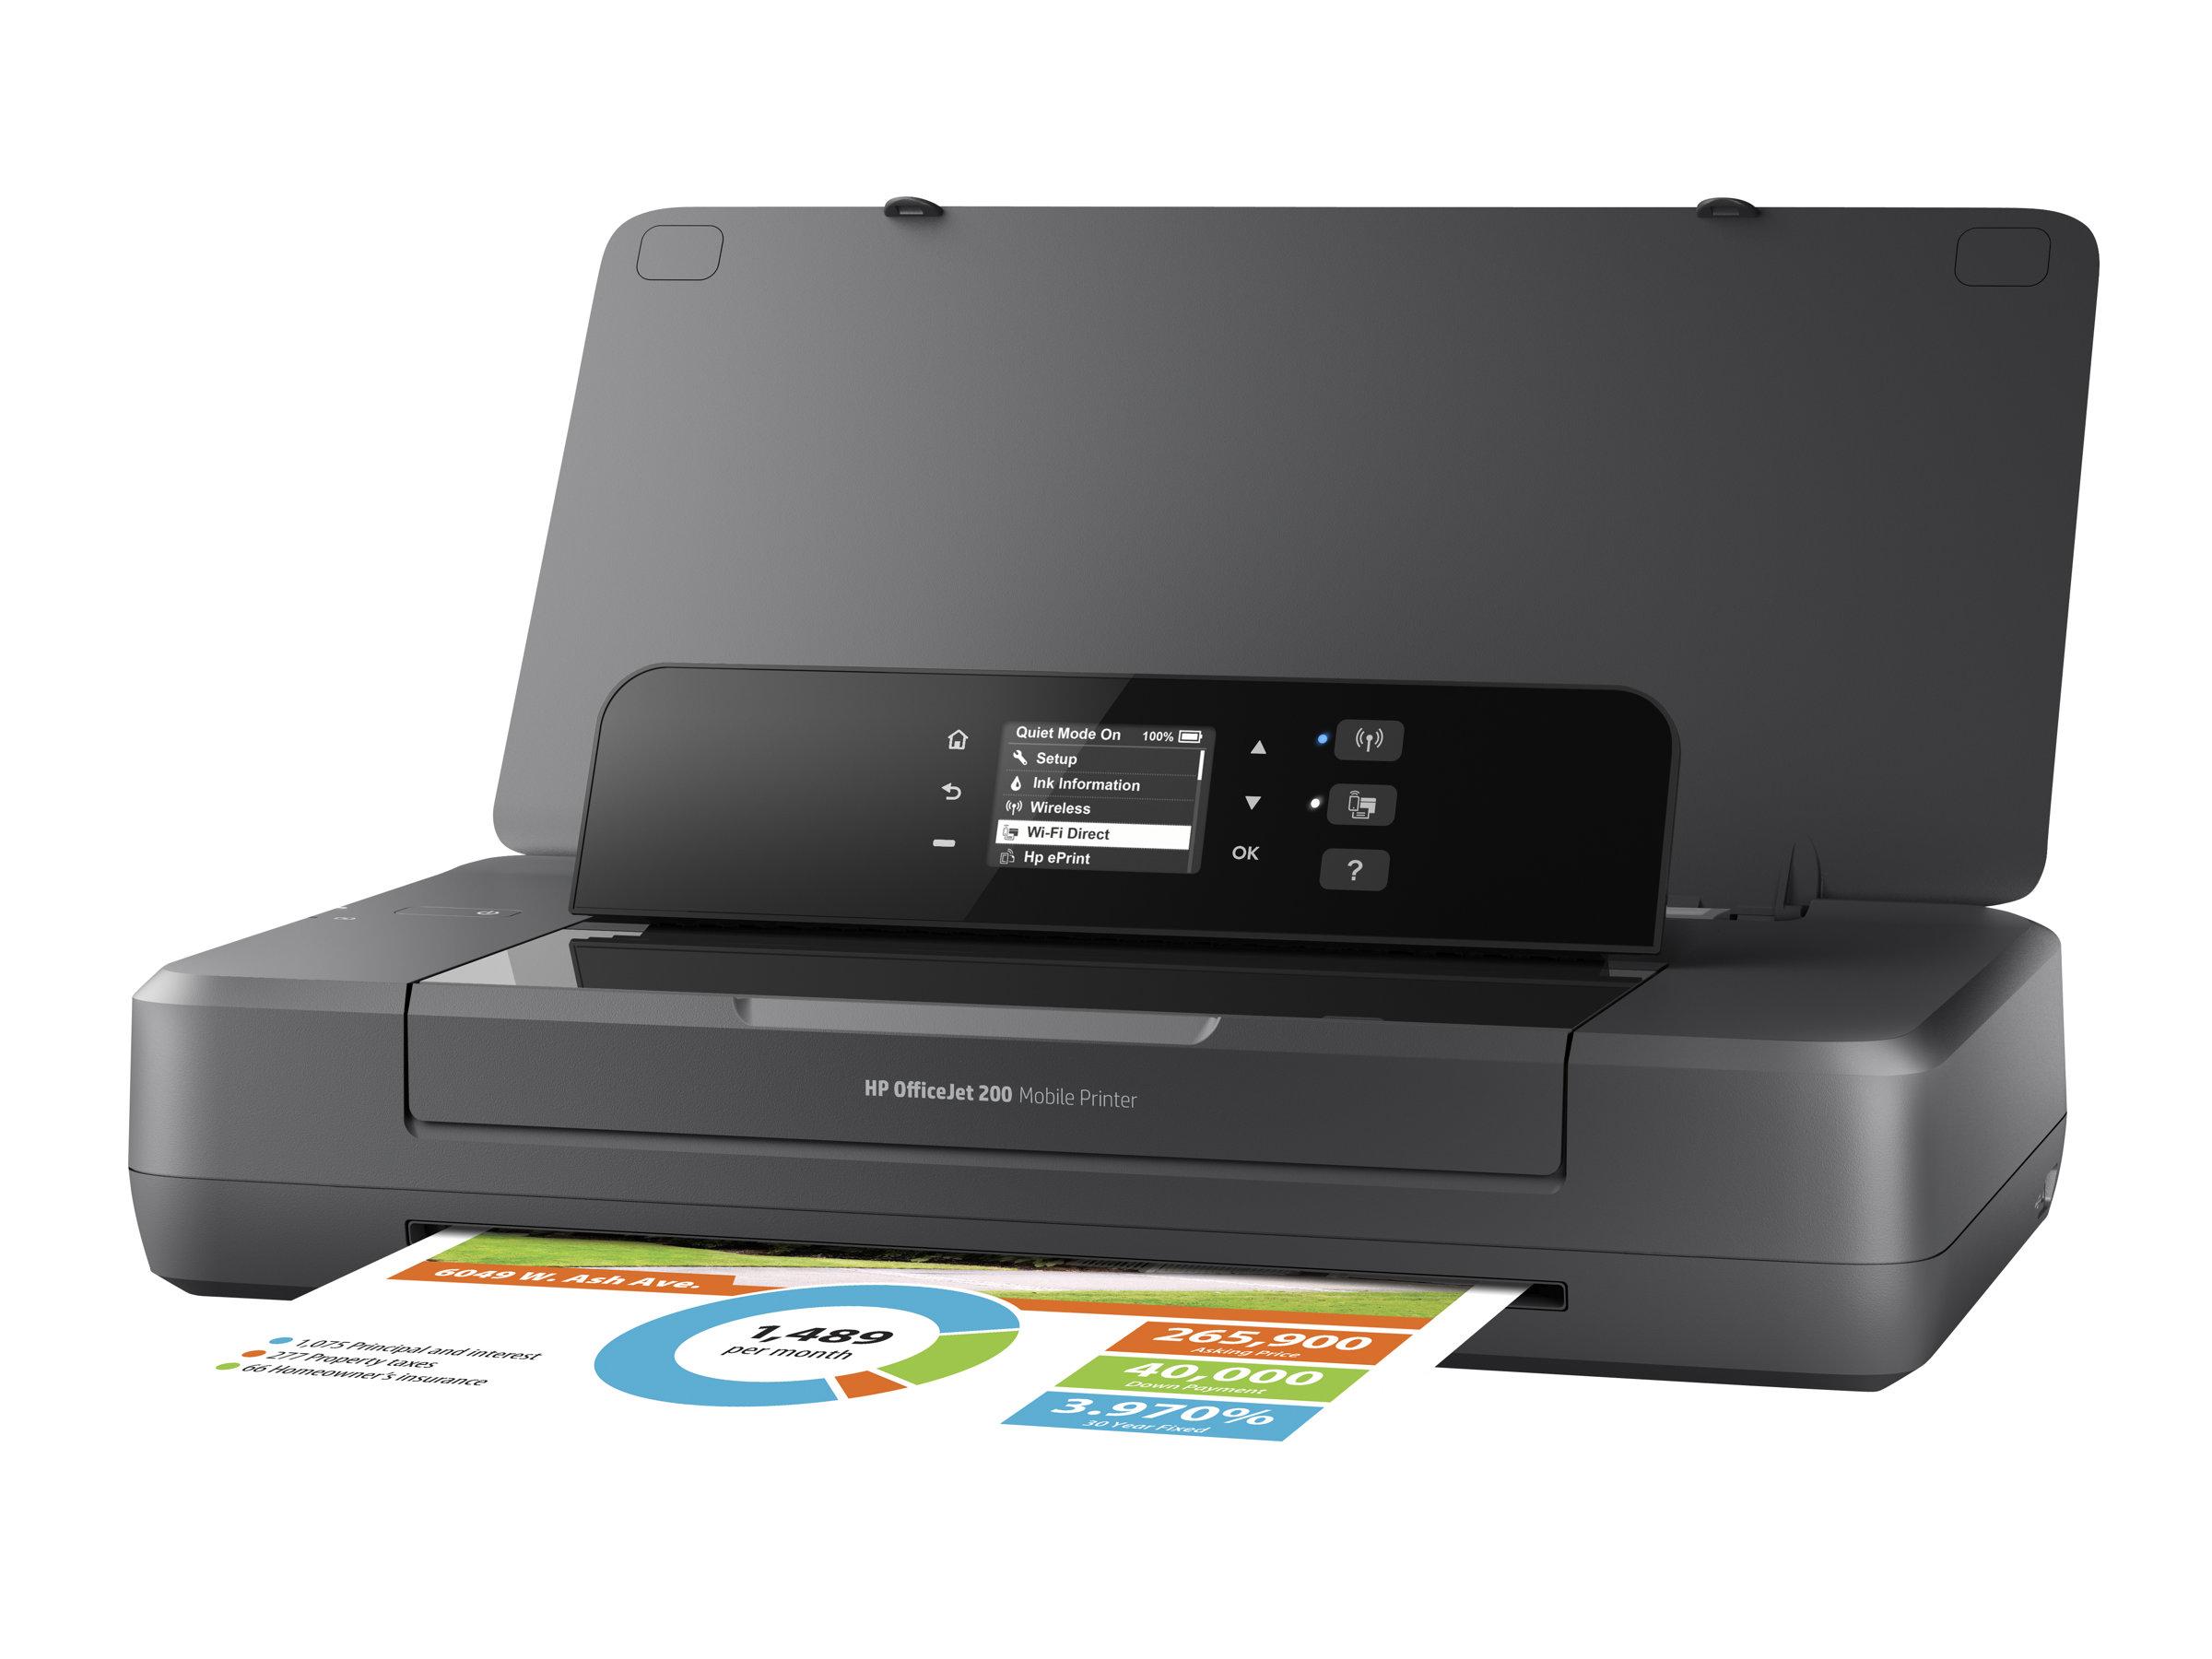 Vorschau: HP Officejet 200 Mobile Printer